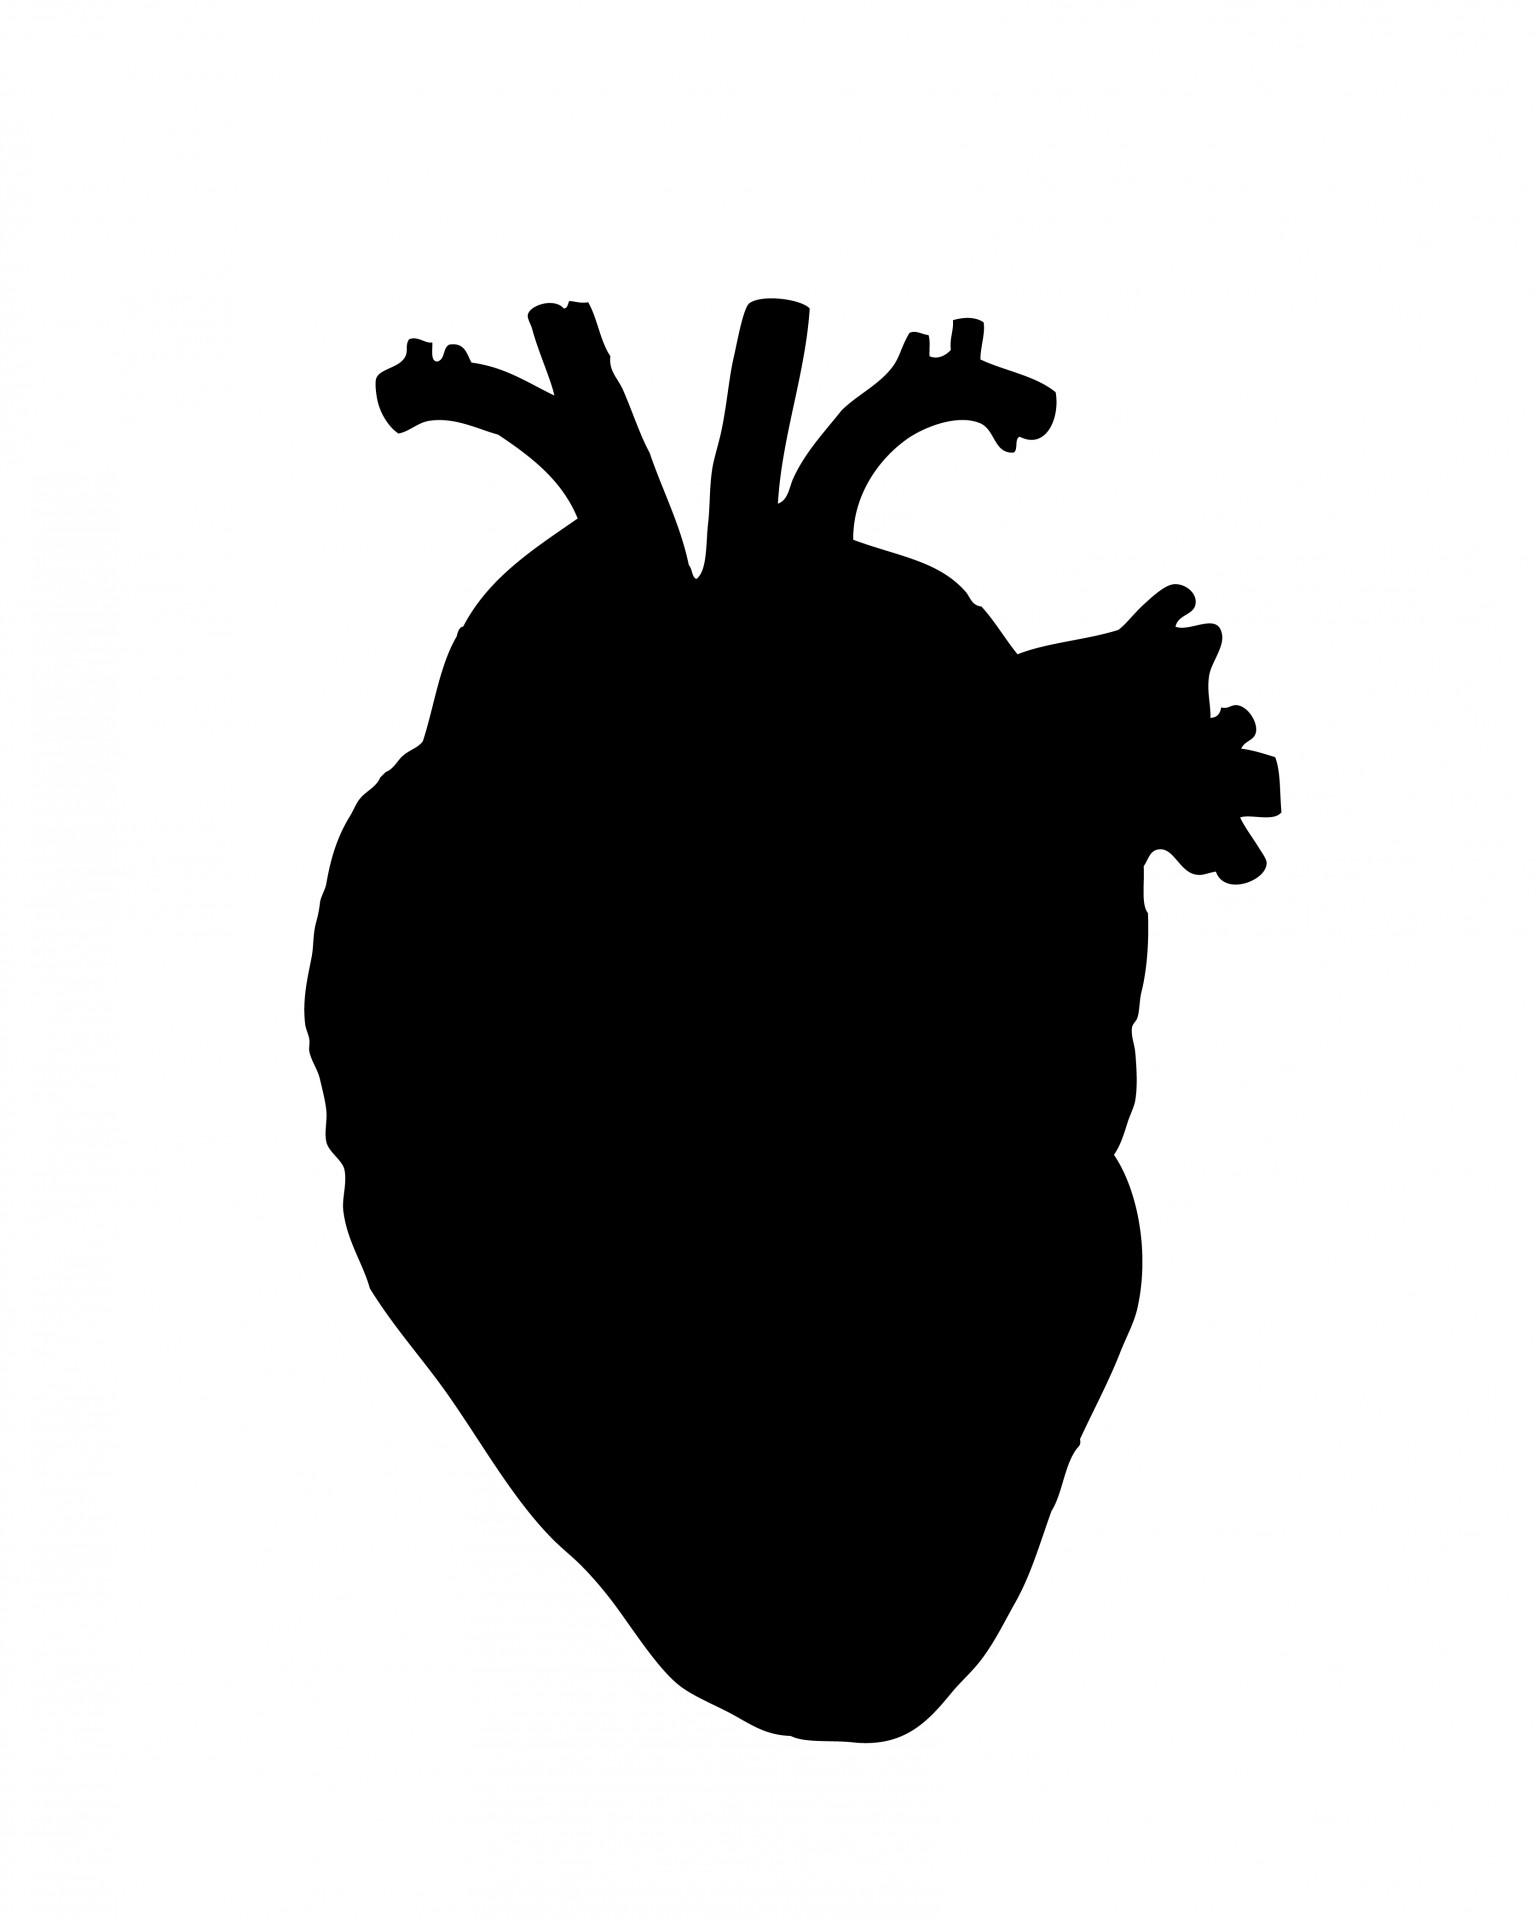 1536x1920 Human Heart Free Stock Photo